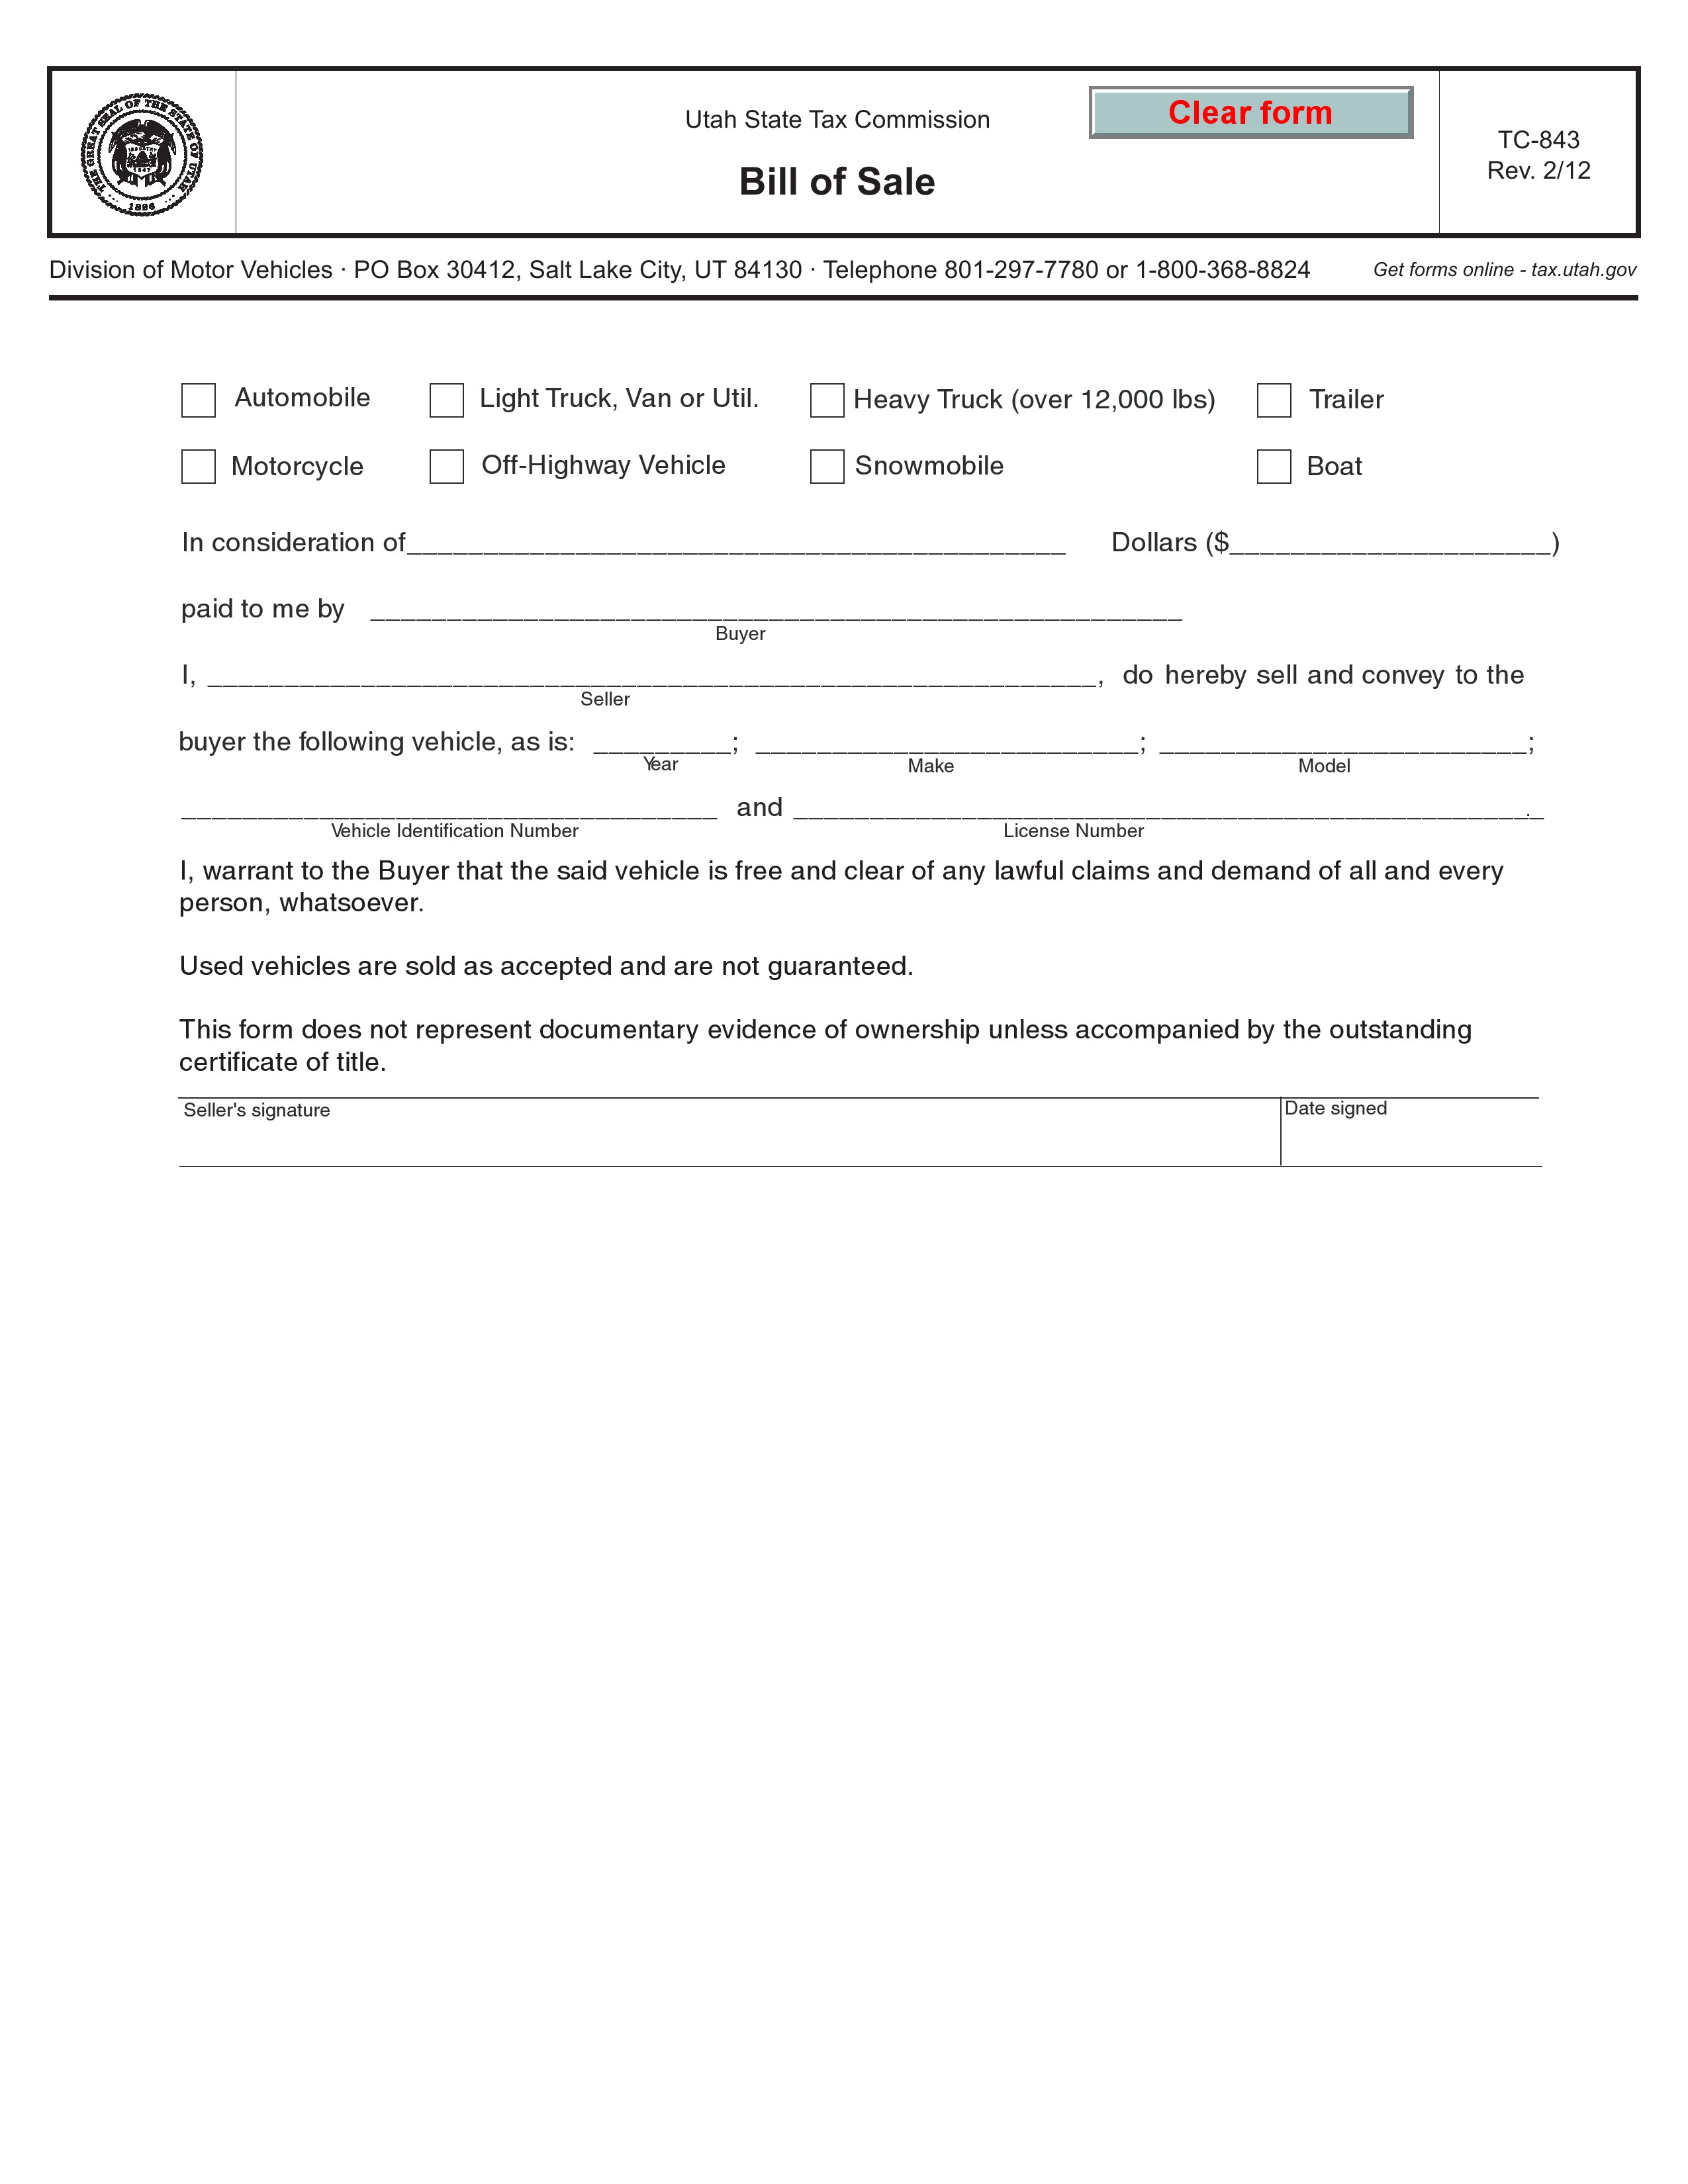 Free Utah Bill Of Sale Tc 843 Pdf Word Do It Yourself Forms Bill of sale template utah